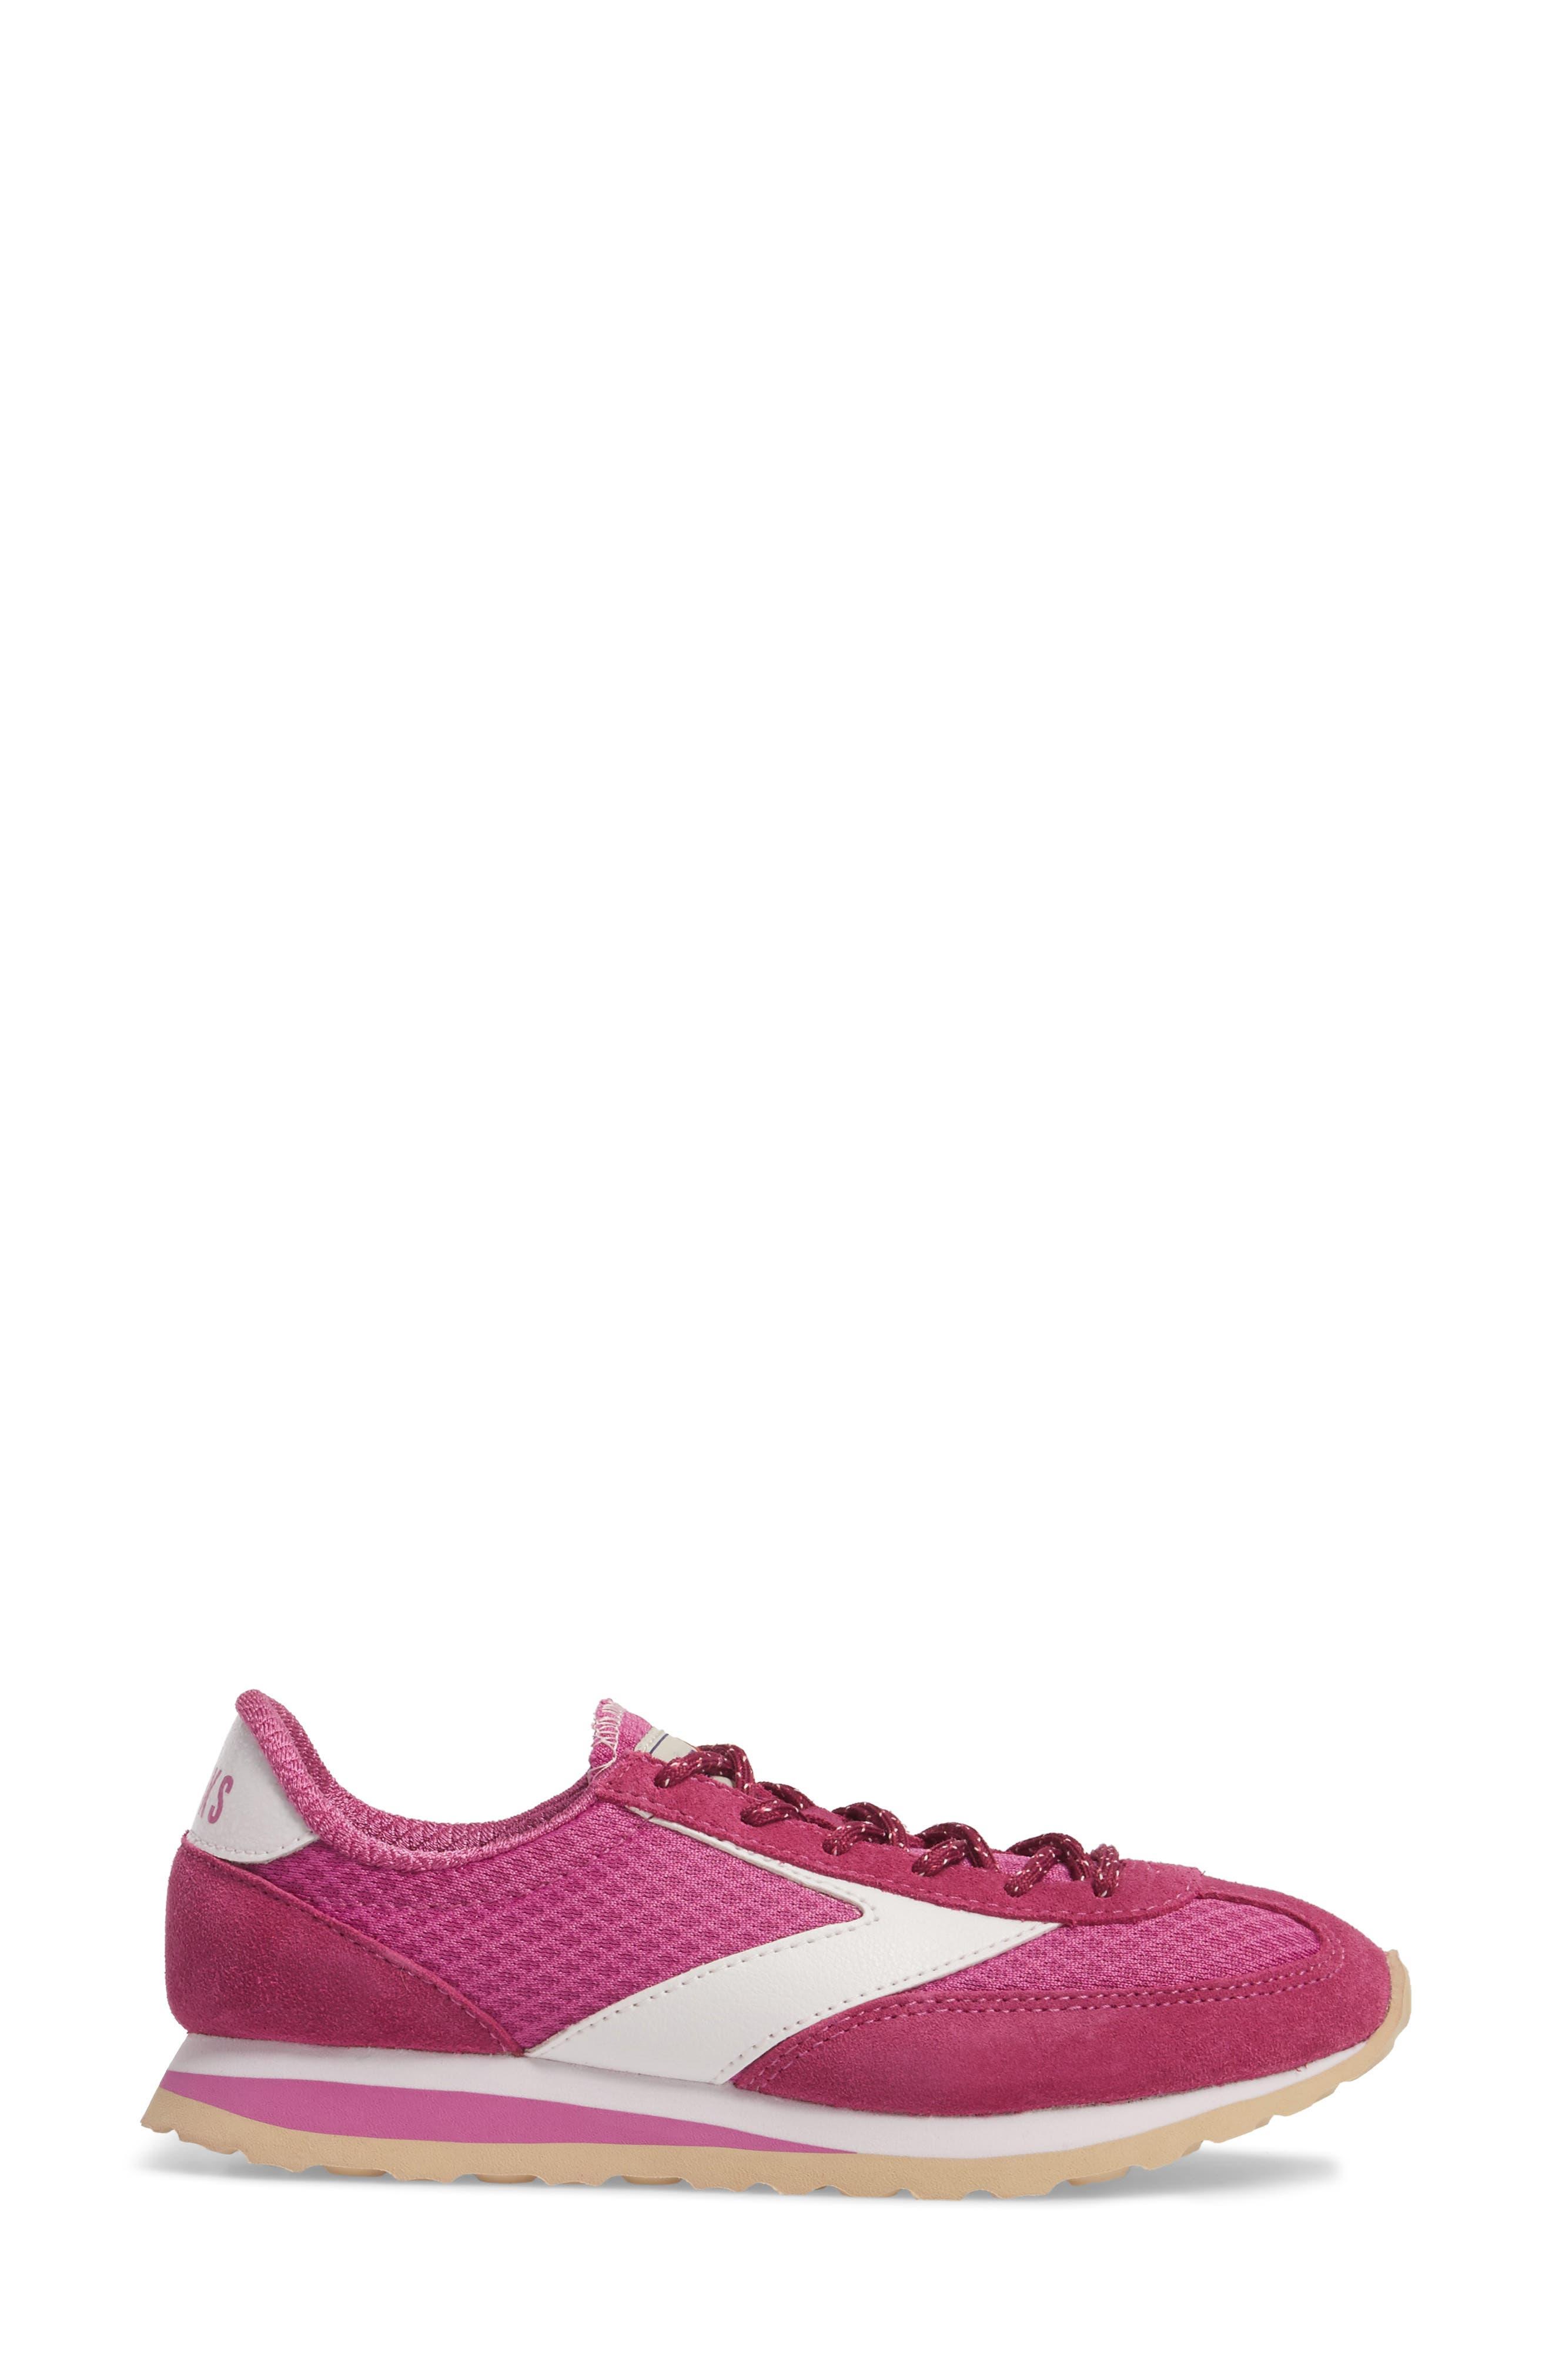 'Vanguard' Sneaker,                             Alternate thumbnail 95, color,